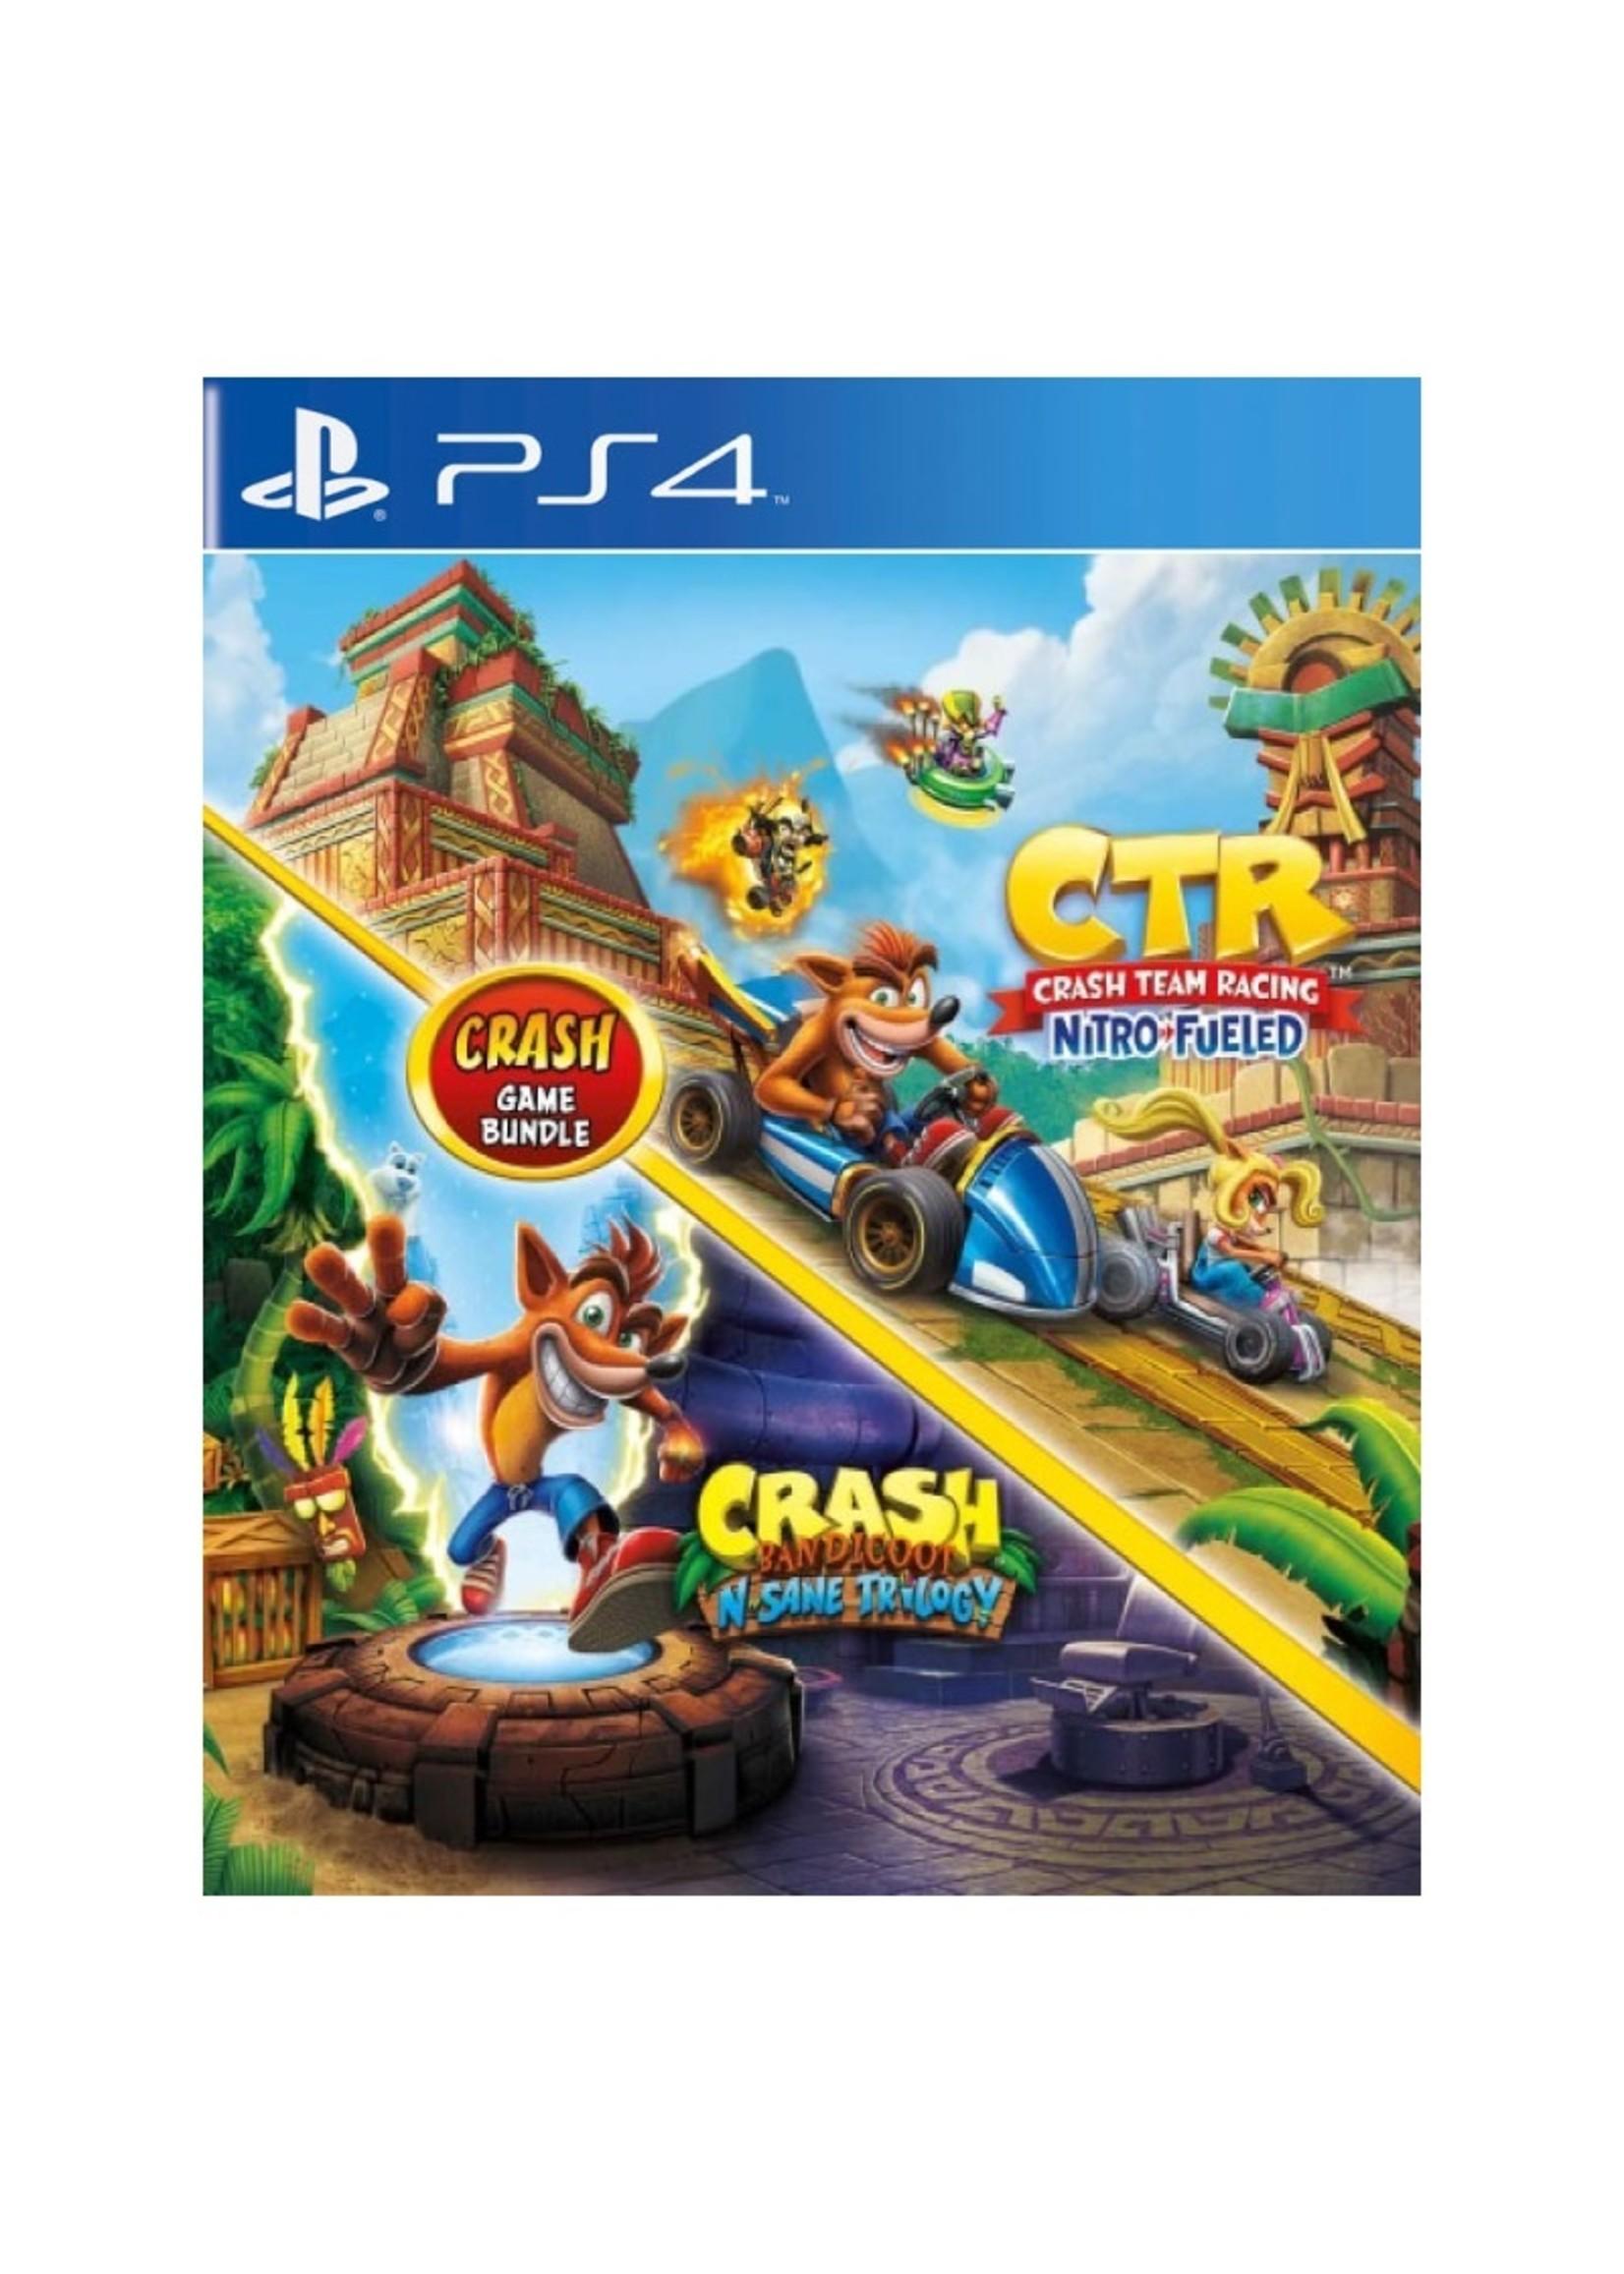 Crash N sane Trilogy + Team Racing Nitro Fueled - PS4 NEW